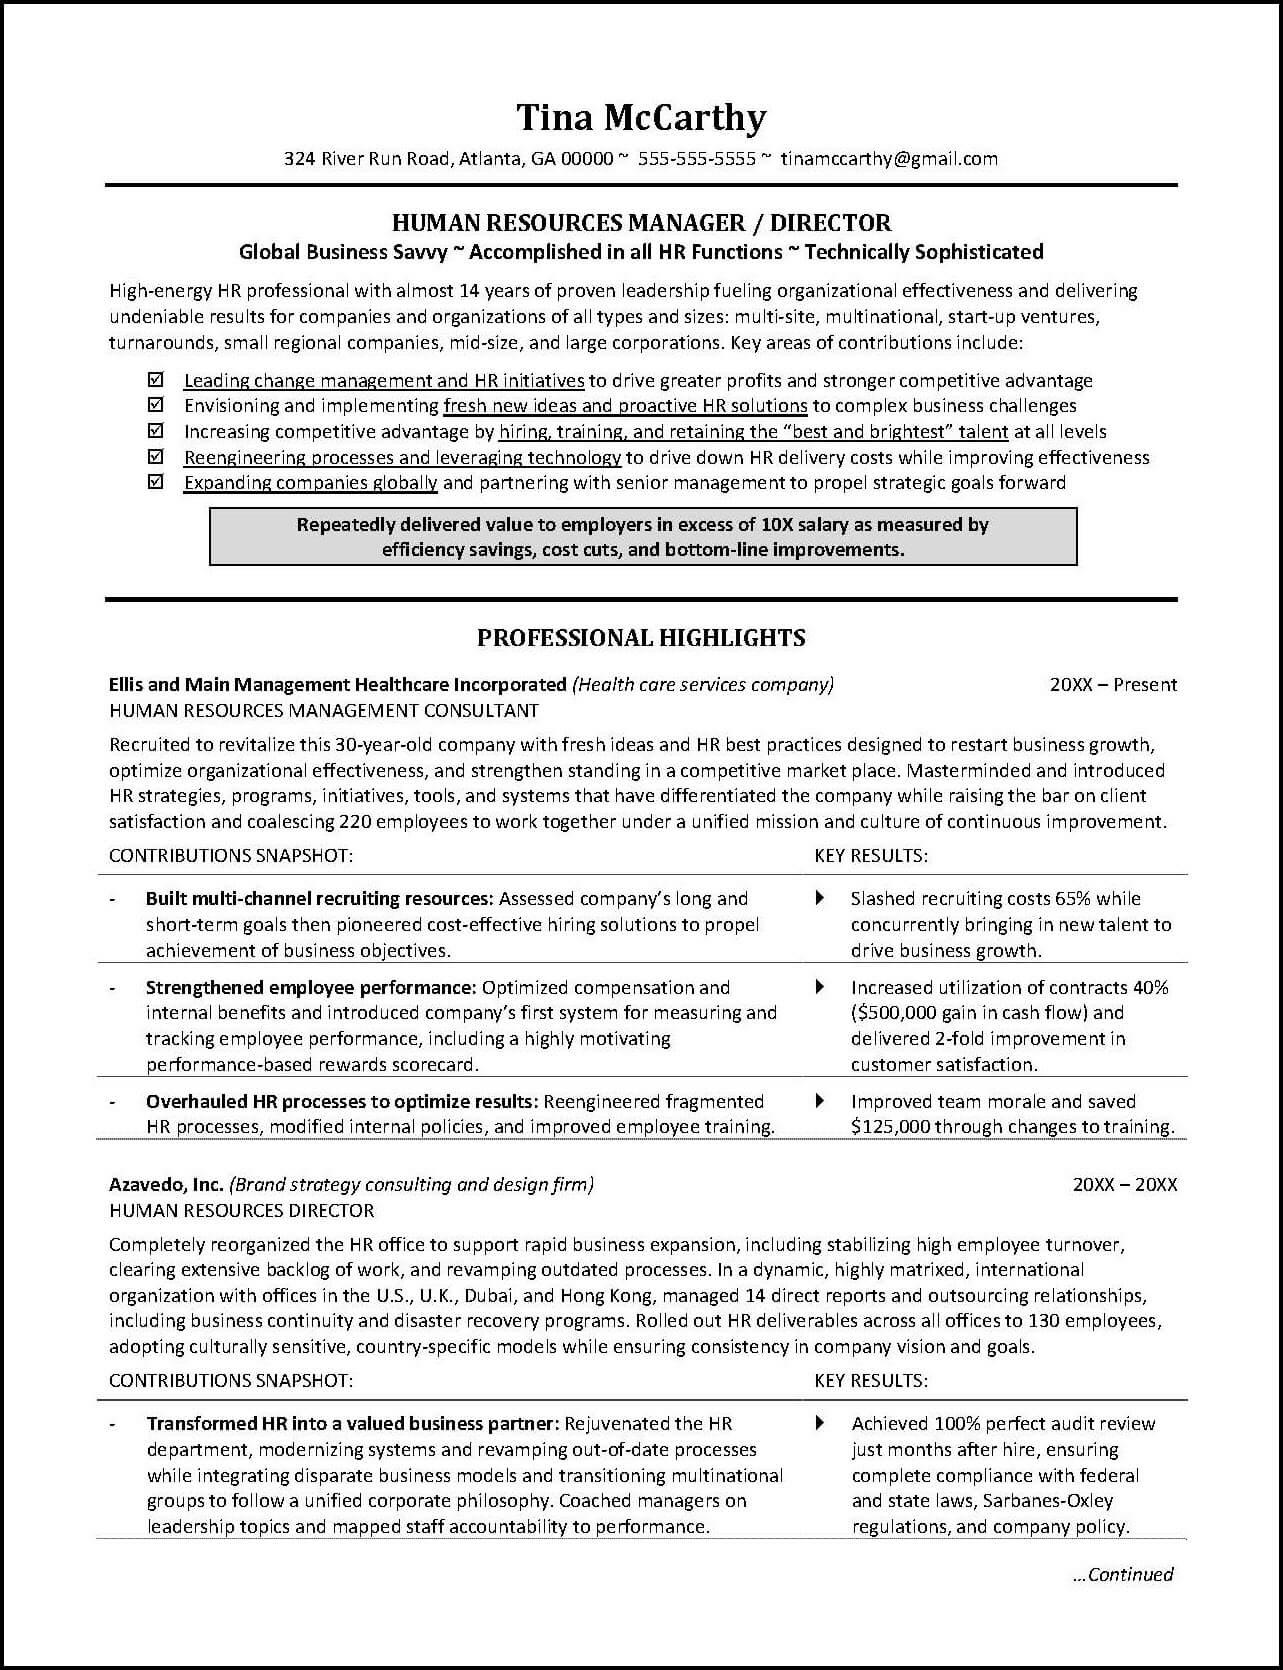 Human Resources Resume Human Resources Resume Page 1 human resources resume|wikiresume.com